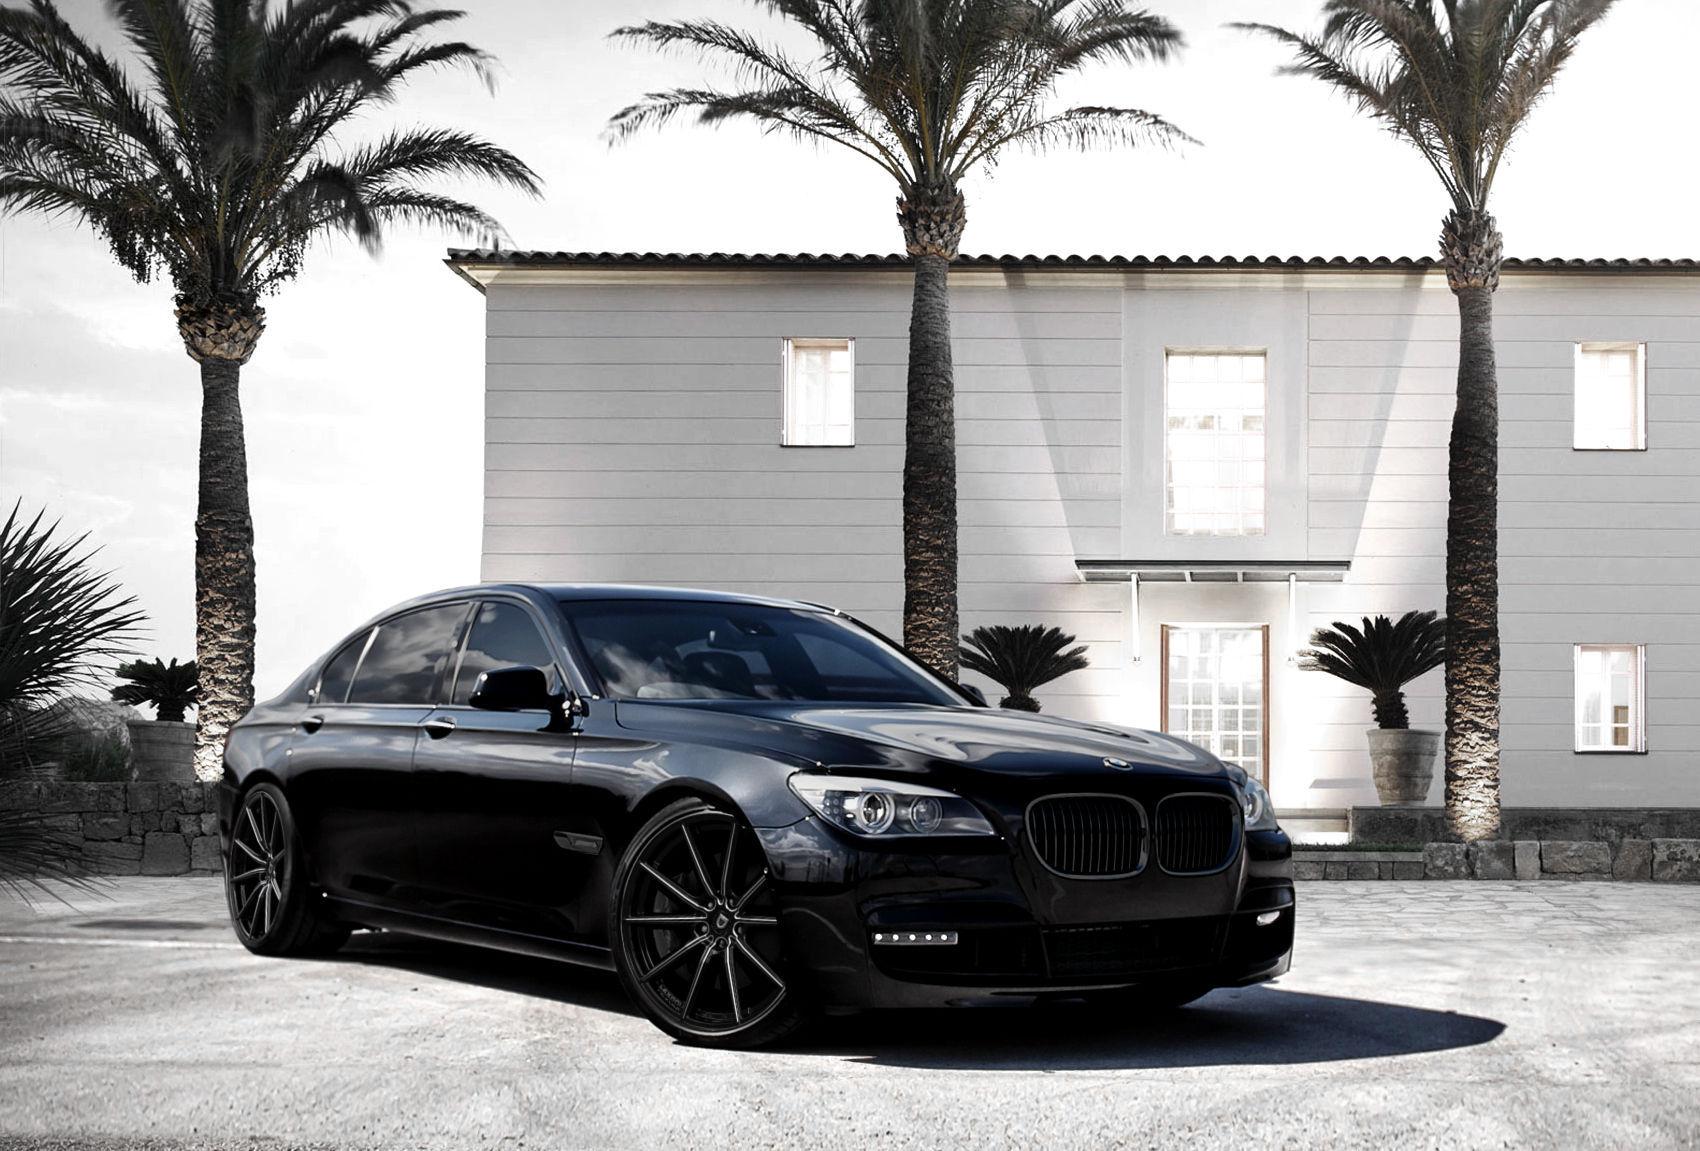 2013 BMW 7 Series | BMW 7-series on Lexani CS-10's